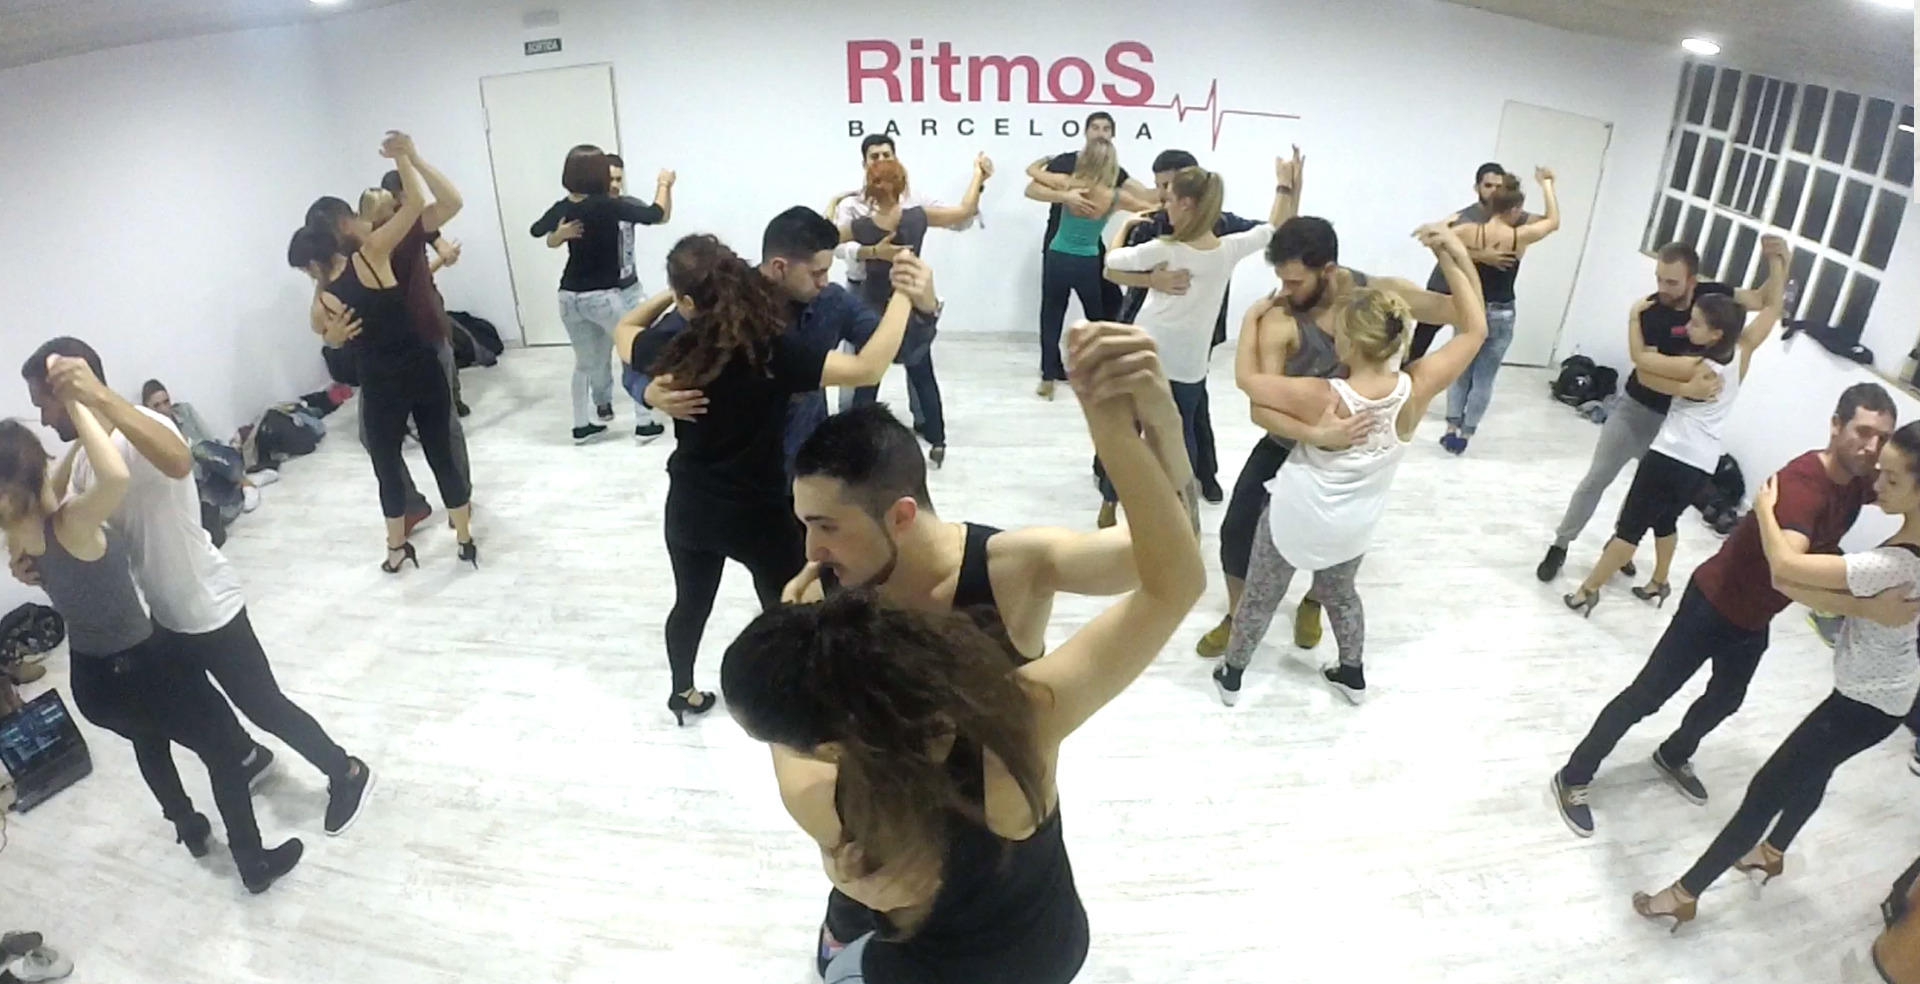 Foto 3 Oferta Gimnasio Ritmos Barcelona Barcelona - GymForLess